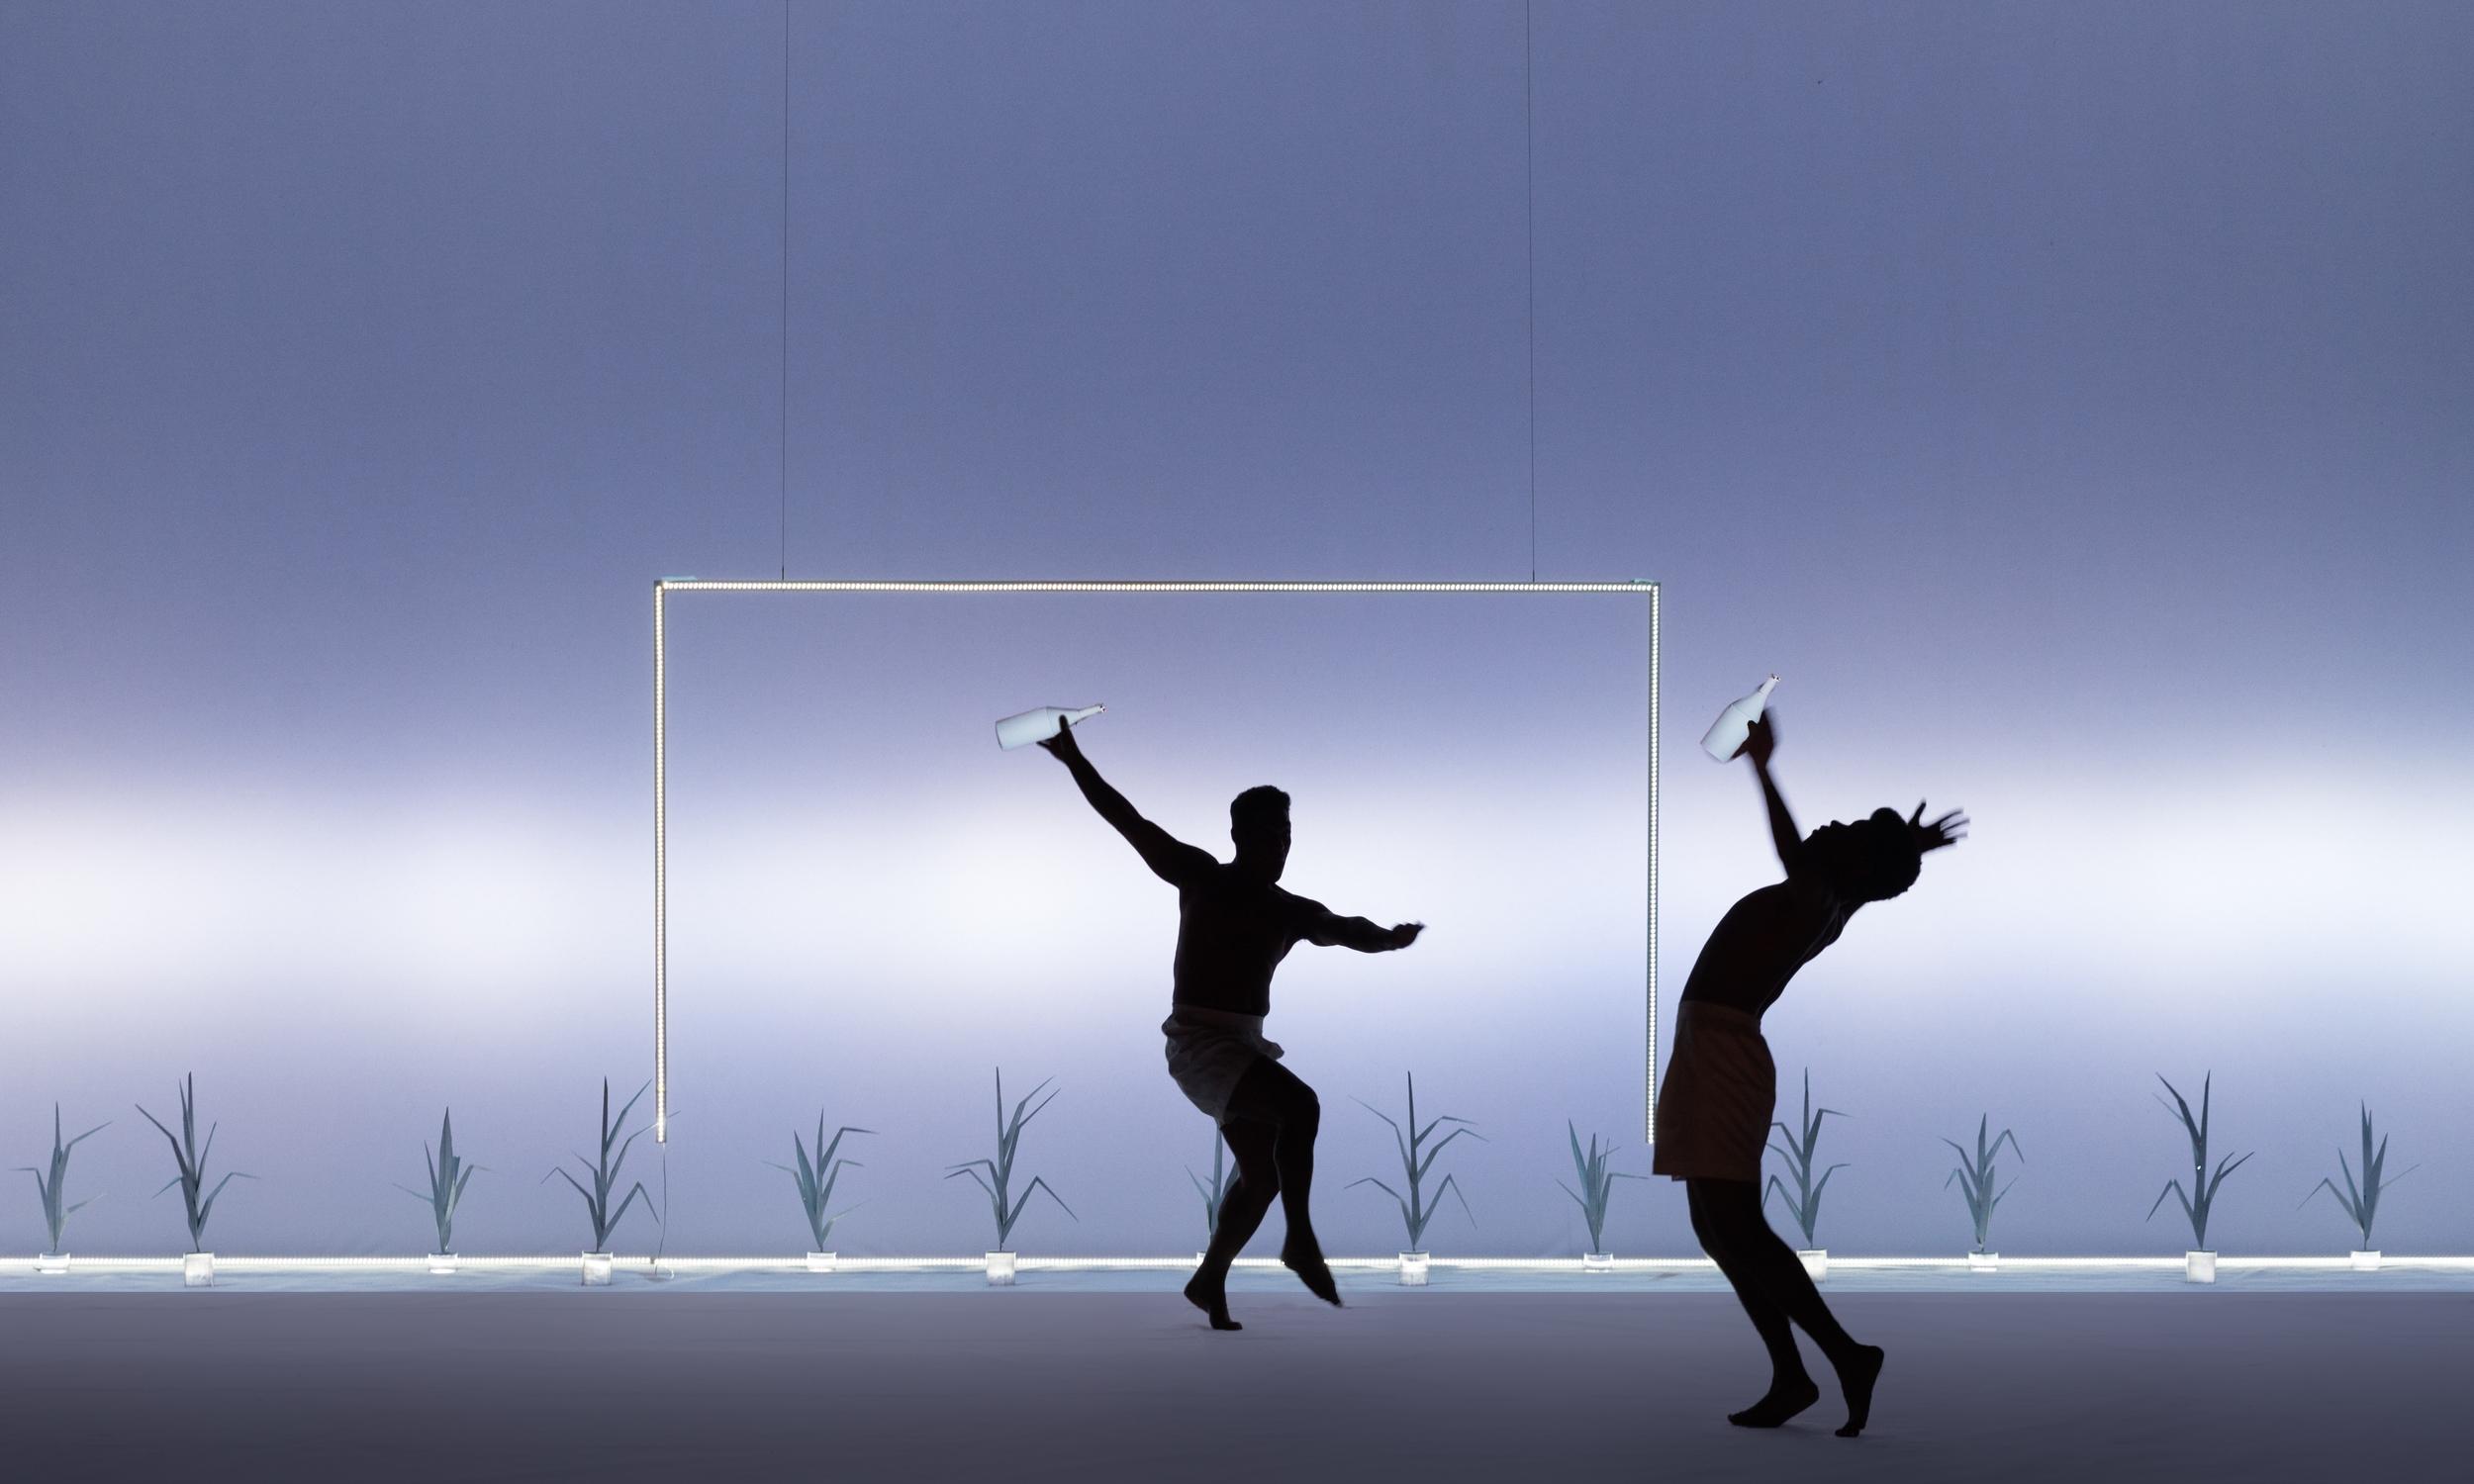 Scene I B - Barefoot Football: Lucas Wickhaus (The Friend), Jhe Oliveira (Garrincha)